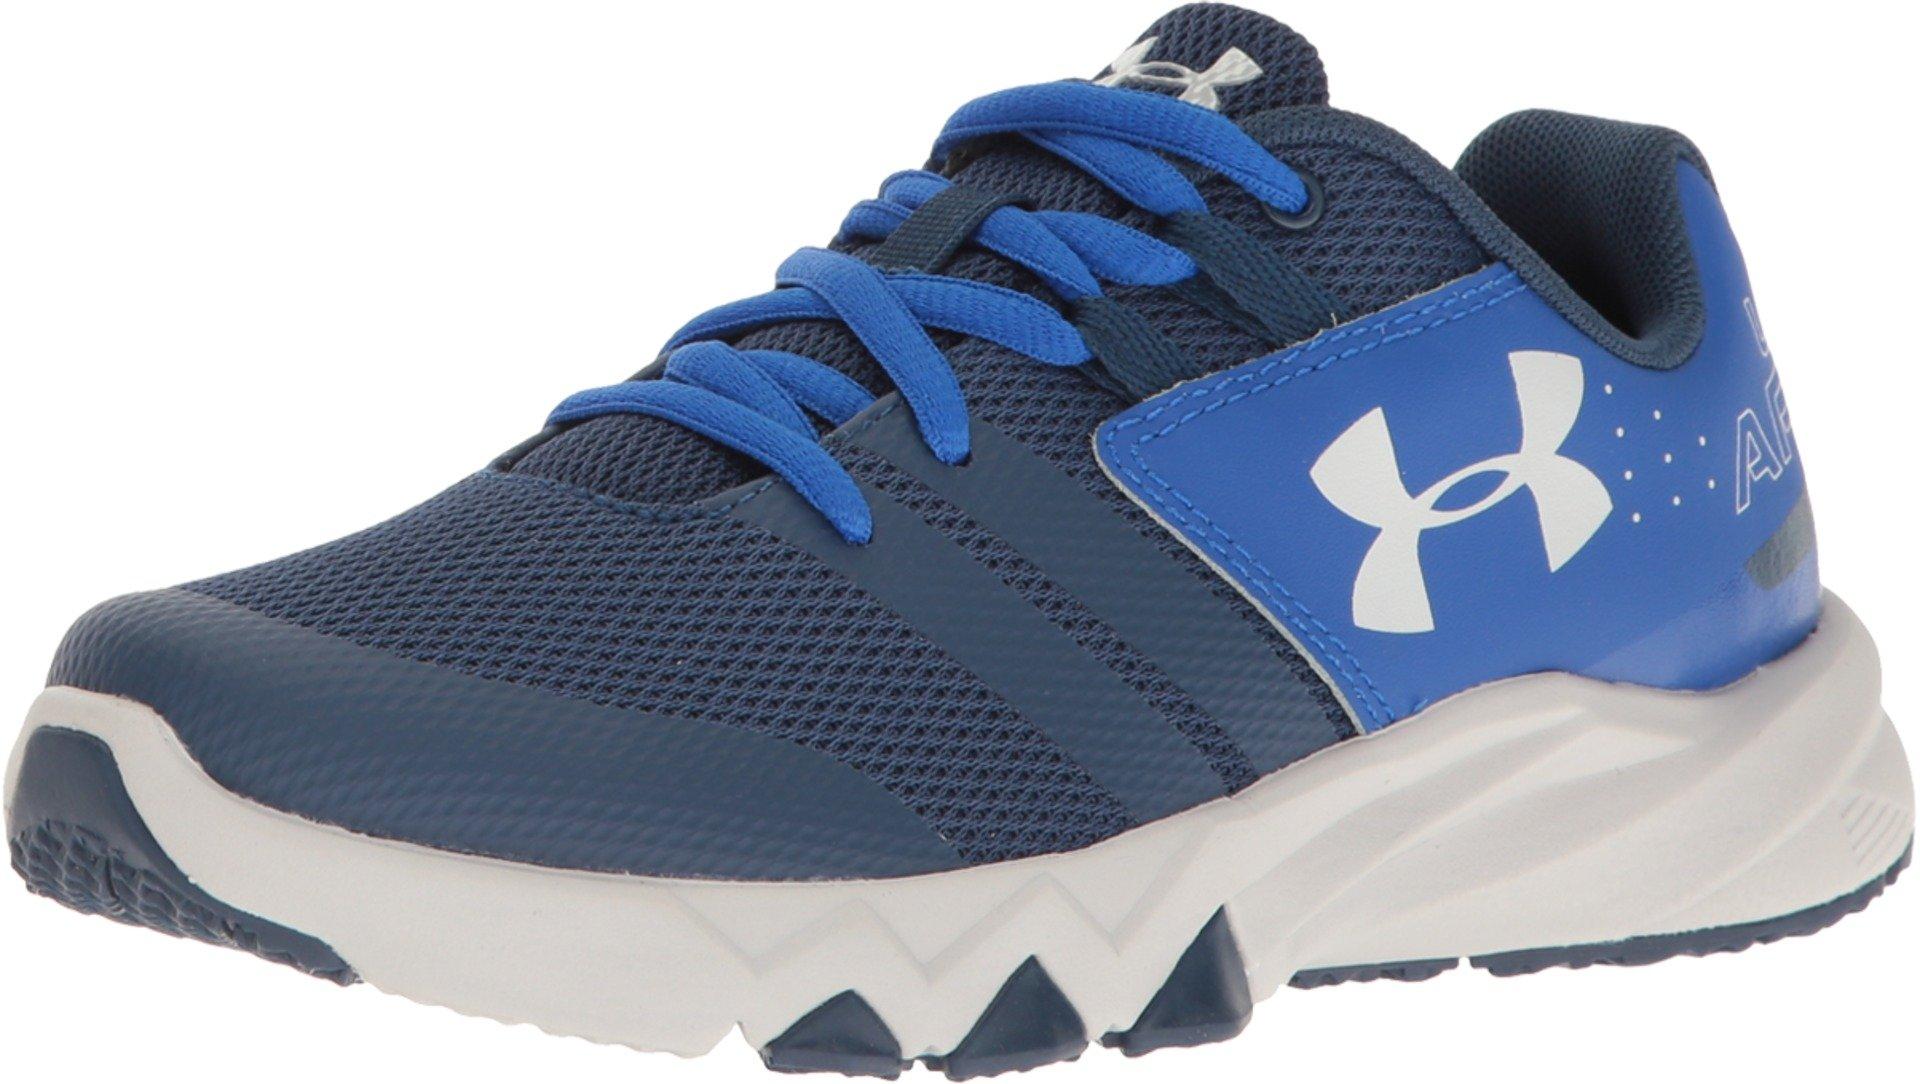 Under Armour Kids Boy's UA BGS Primed (Big Kid) Blackout Navy/Ultra Blue/Aluminum Athletic Shoe